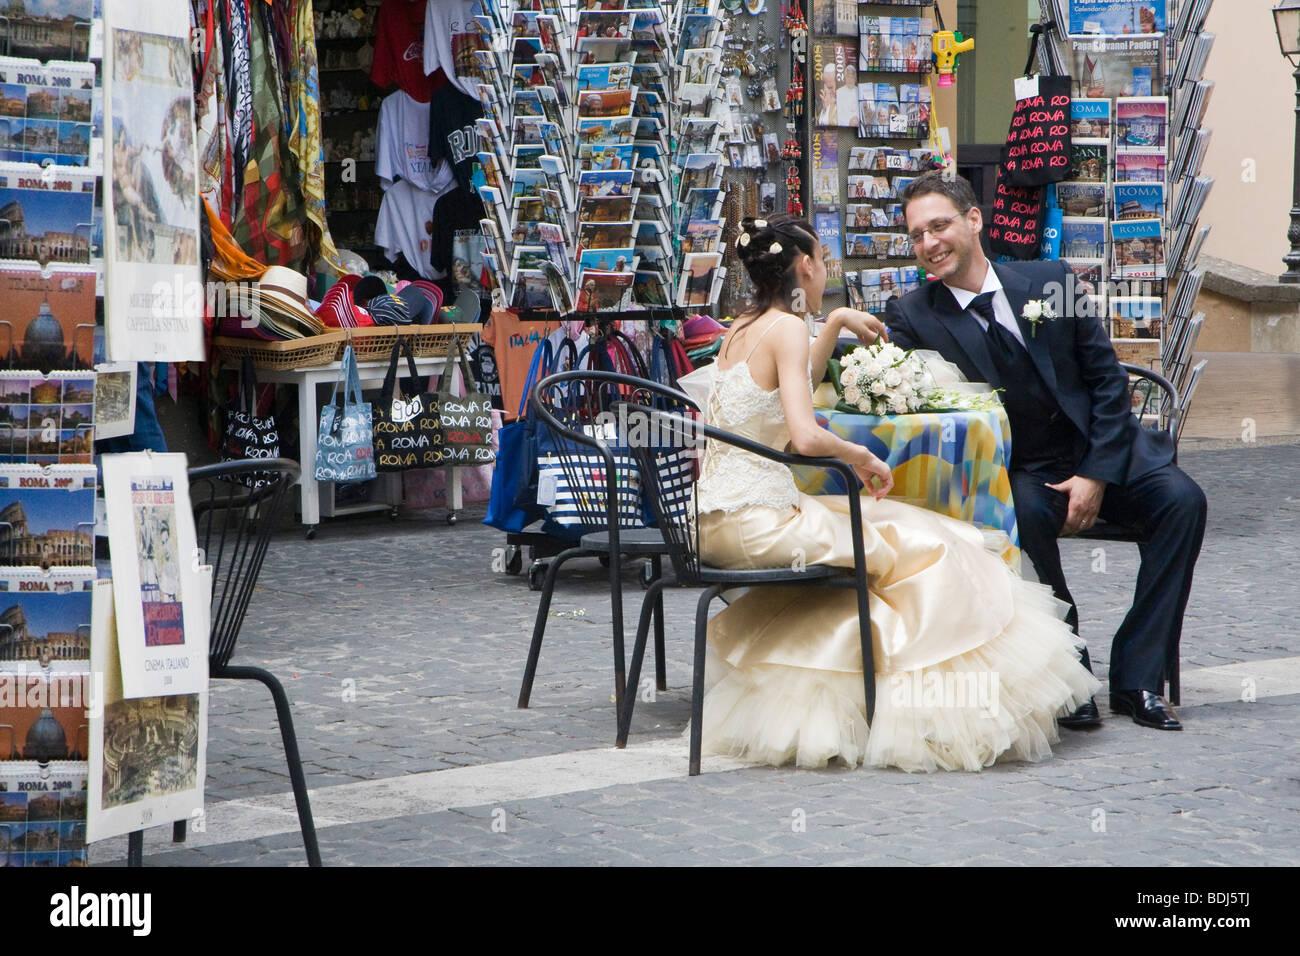 Piazza della Liberta in Castel Gandolfo,wedding couple at a table outside a tourist gift shop, Italy - Stock Image